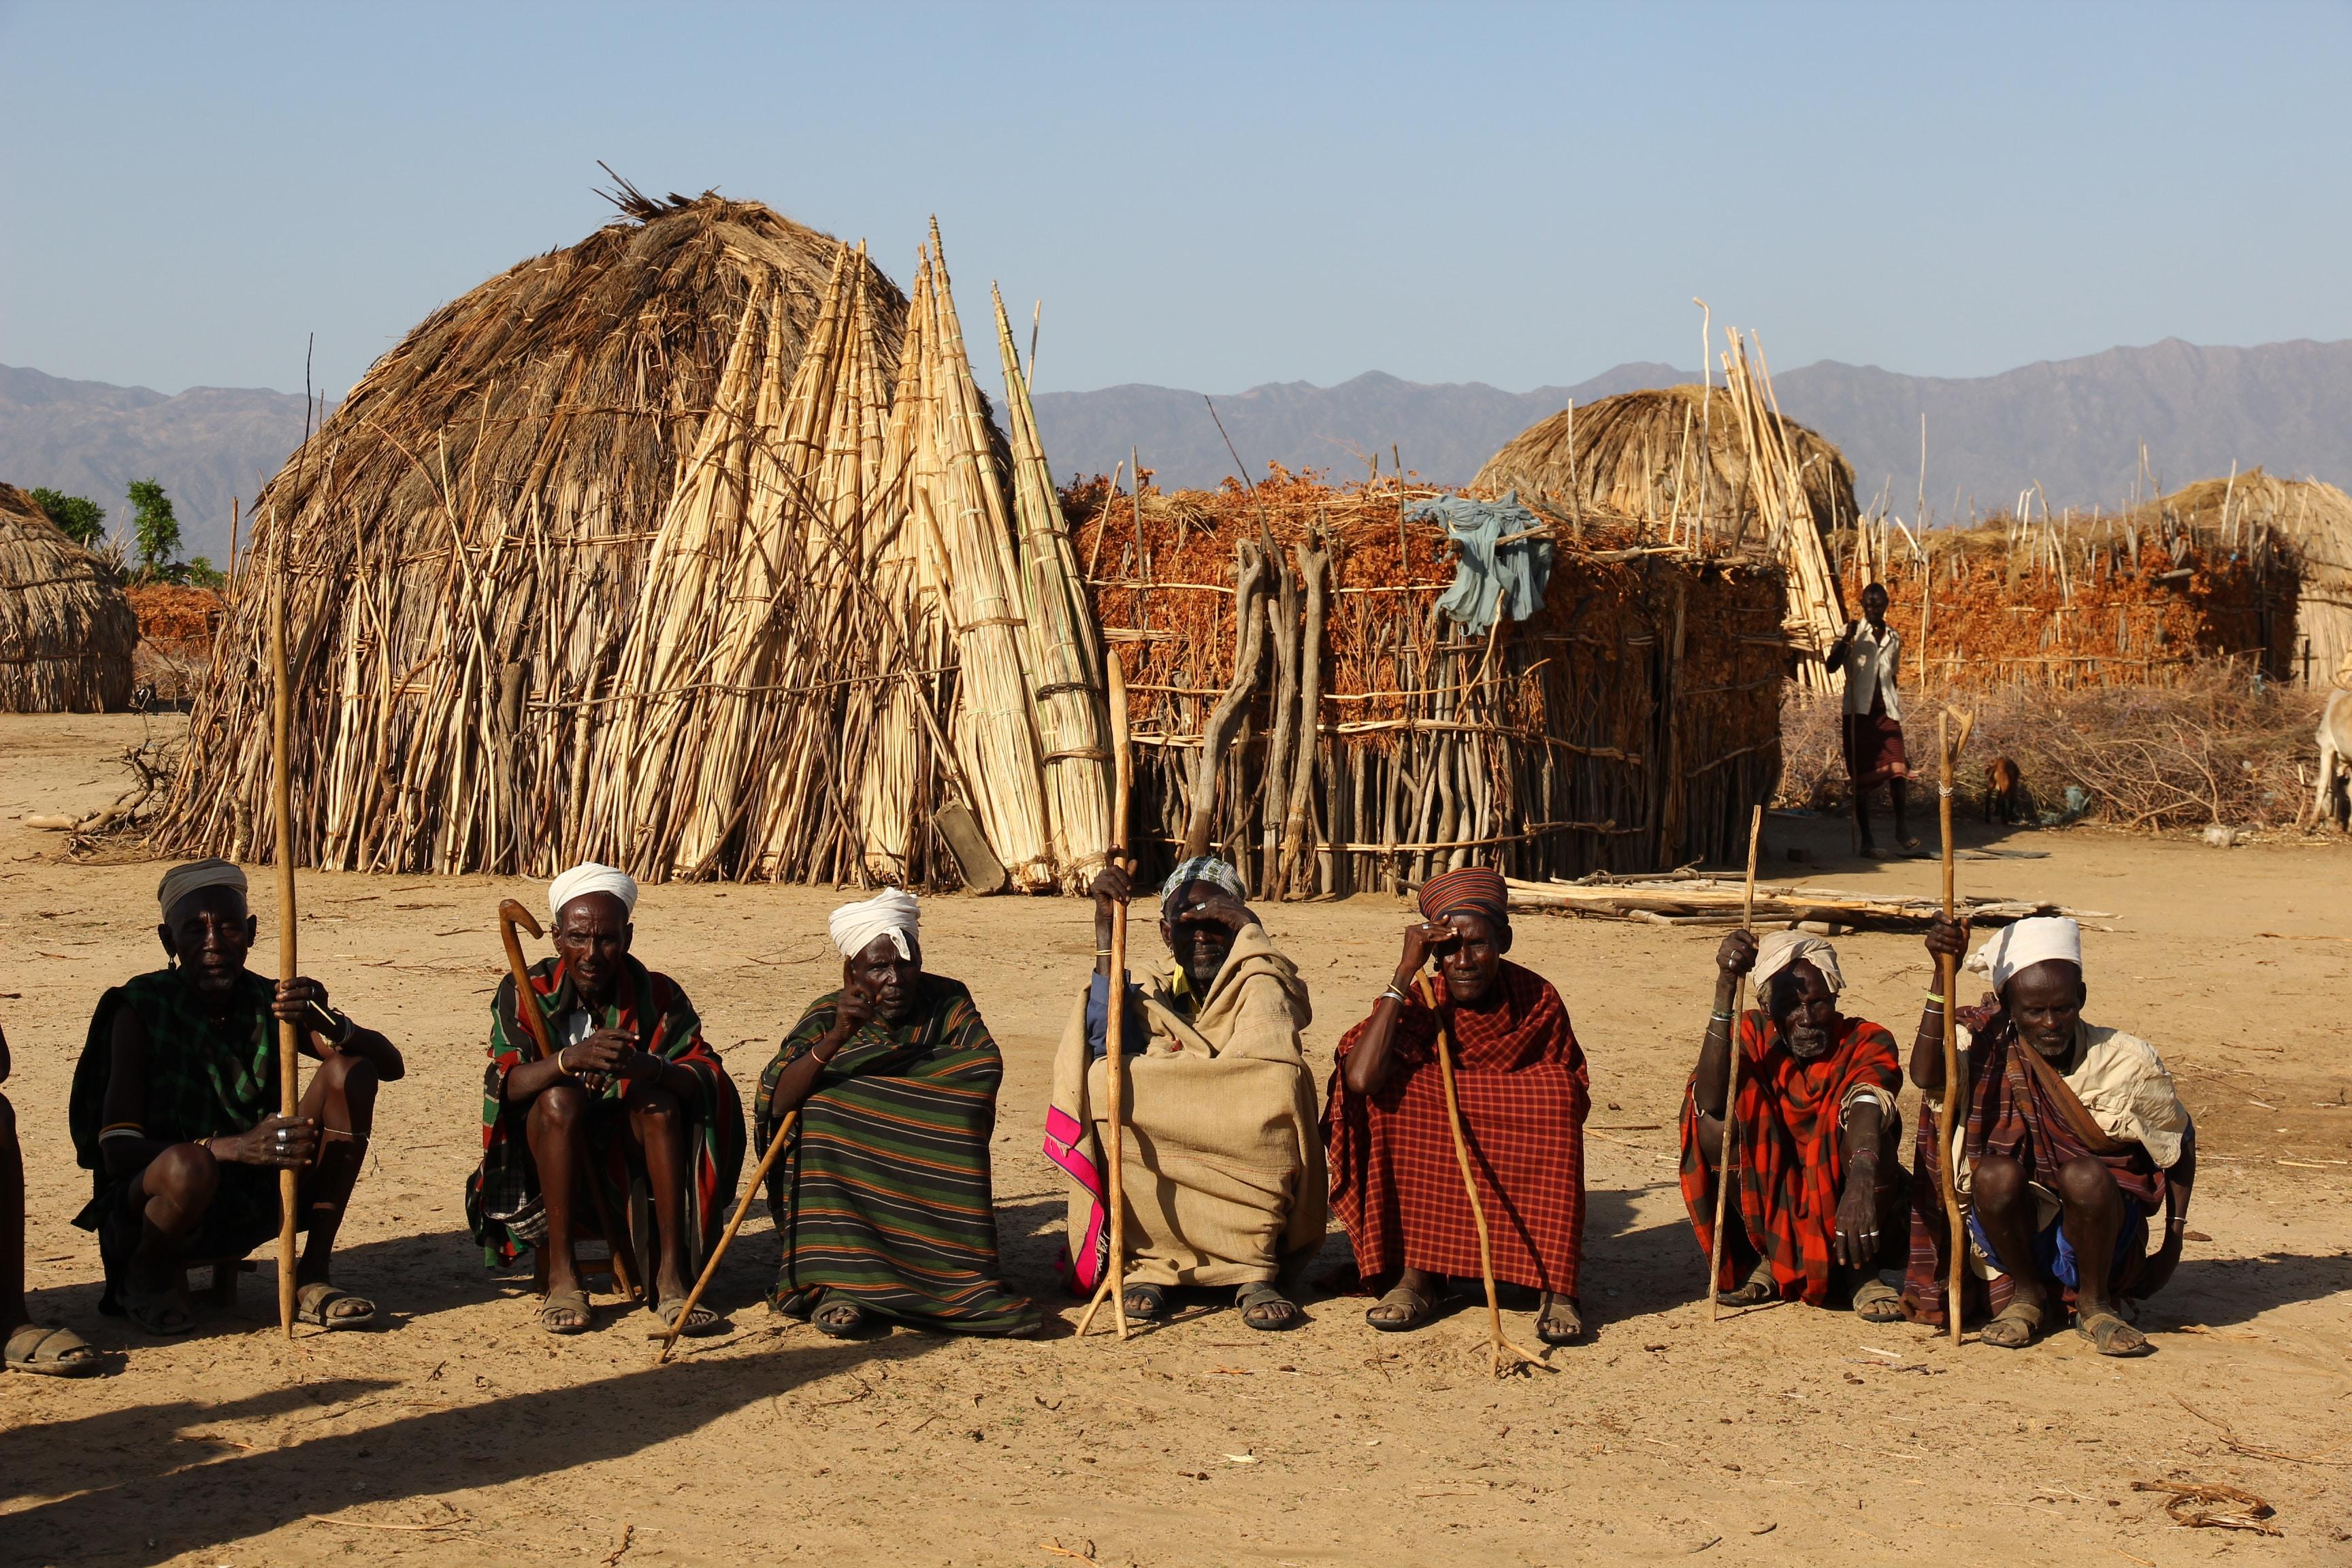 group of tribal men sitting on soil while holding sticks